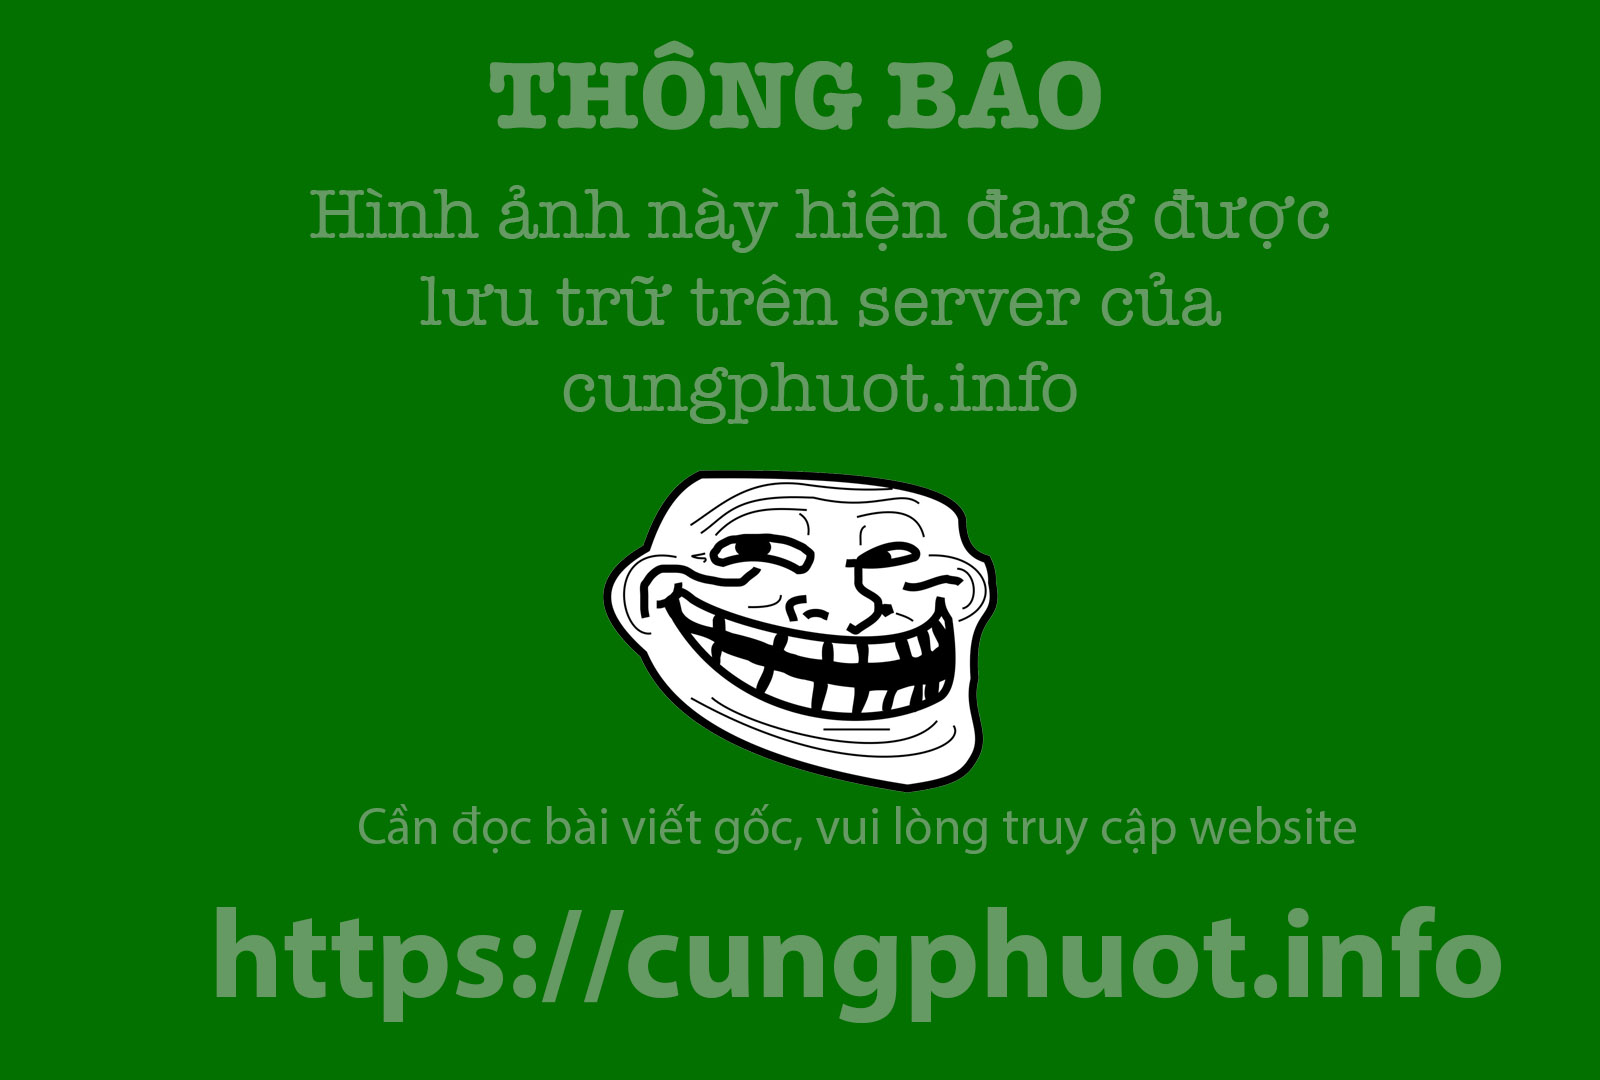 Dan phuot me man ve dep ky vi cua hang Prai o Quang Tri hinh anh 12